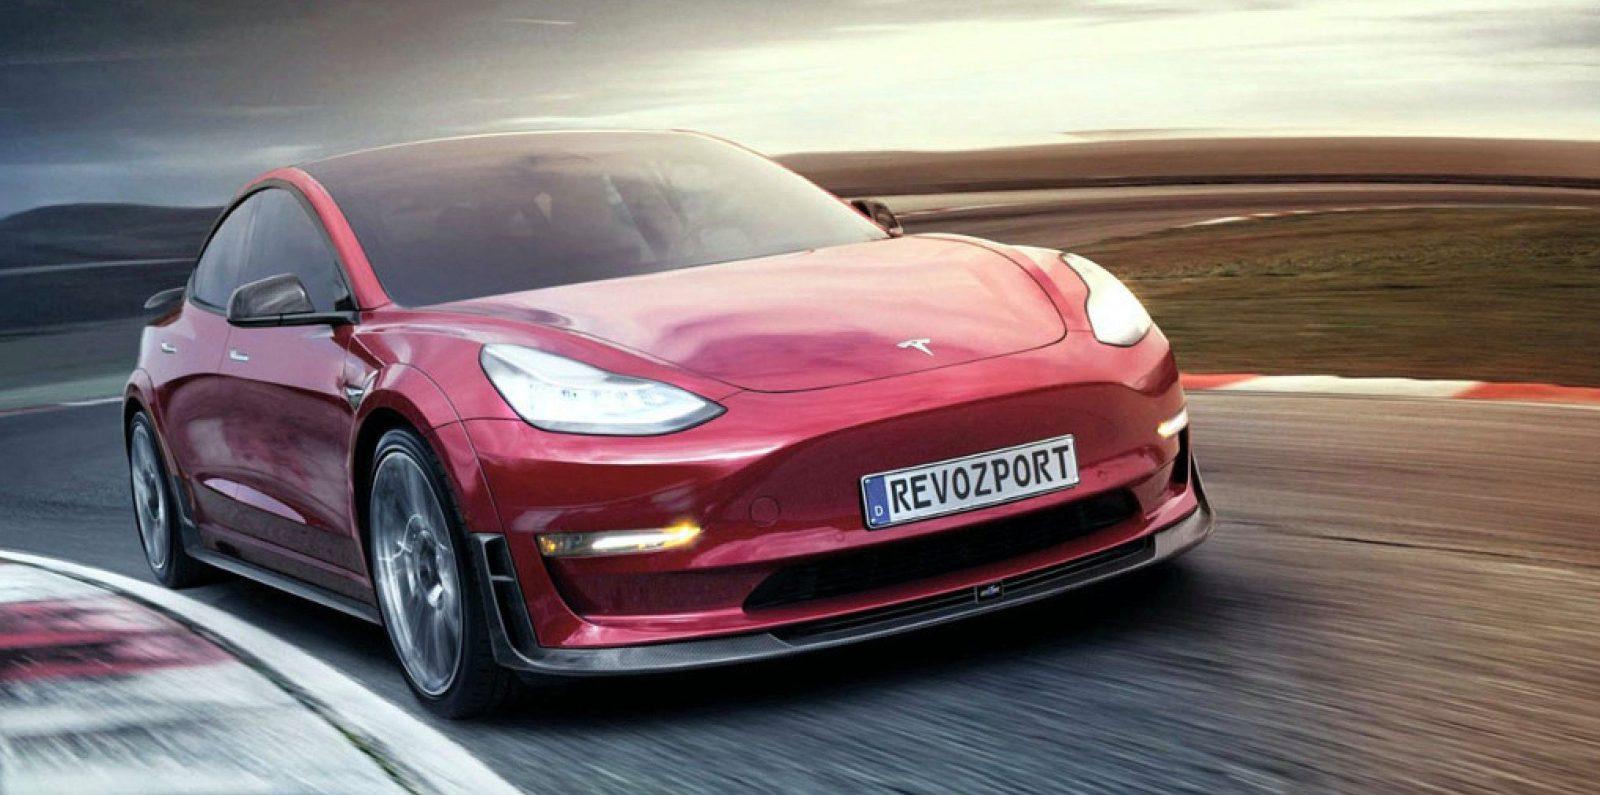 Tesla Model 3 gets agressive new look with aftermarket RevoZport